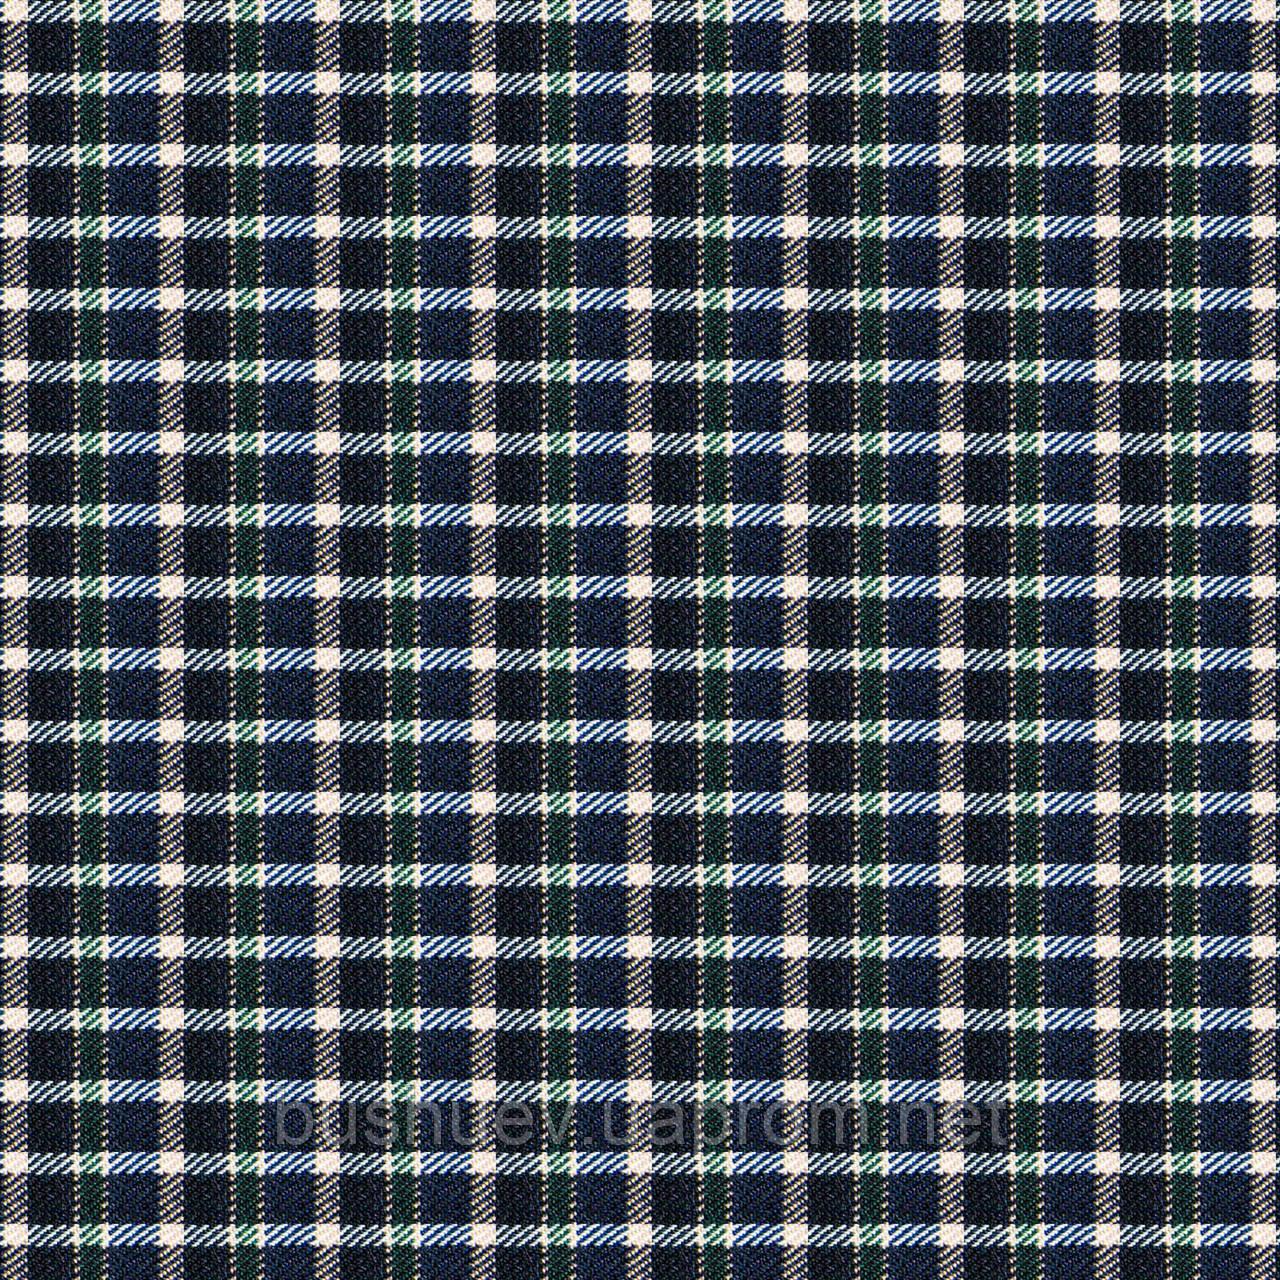 Шотландка на флисе (P3522 дизайн 1)